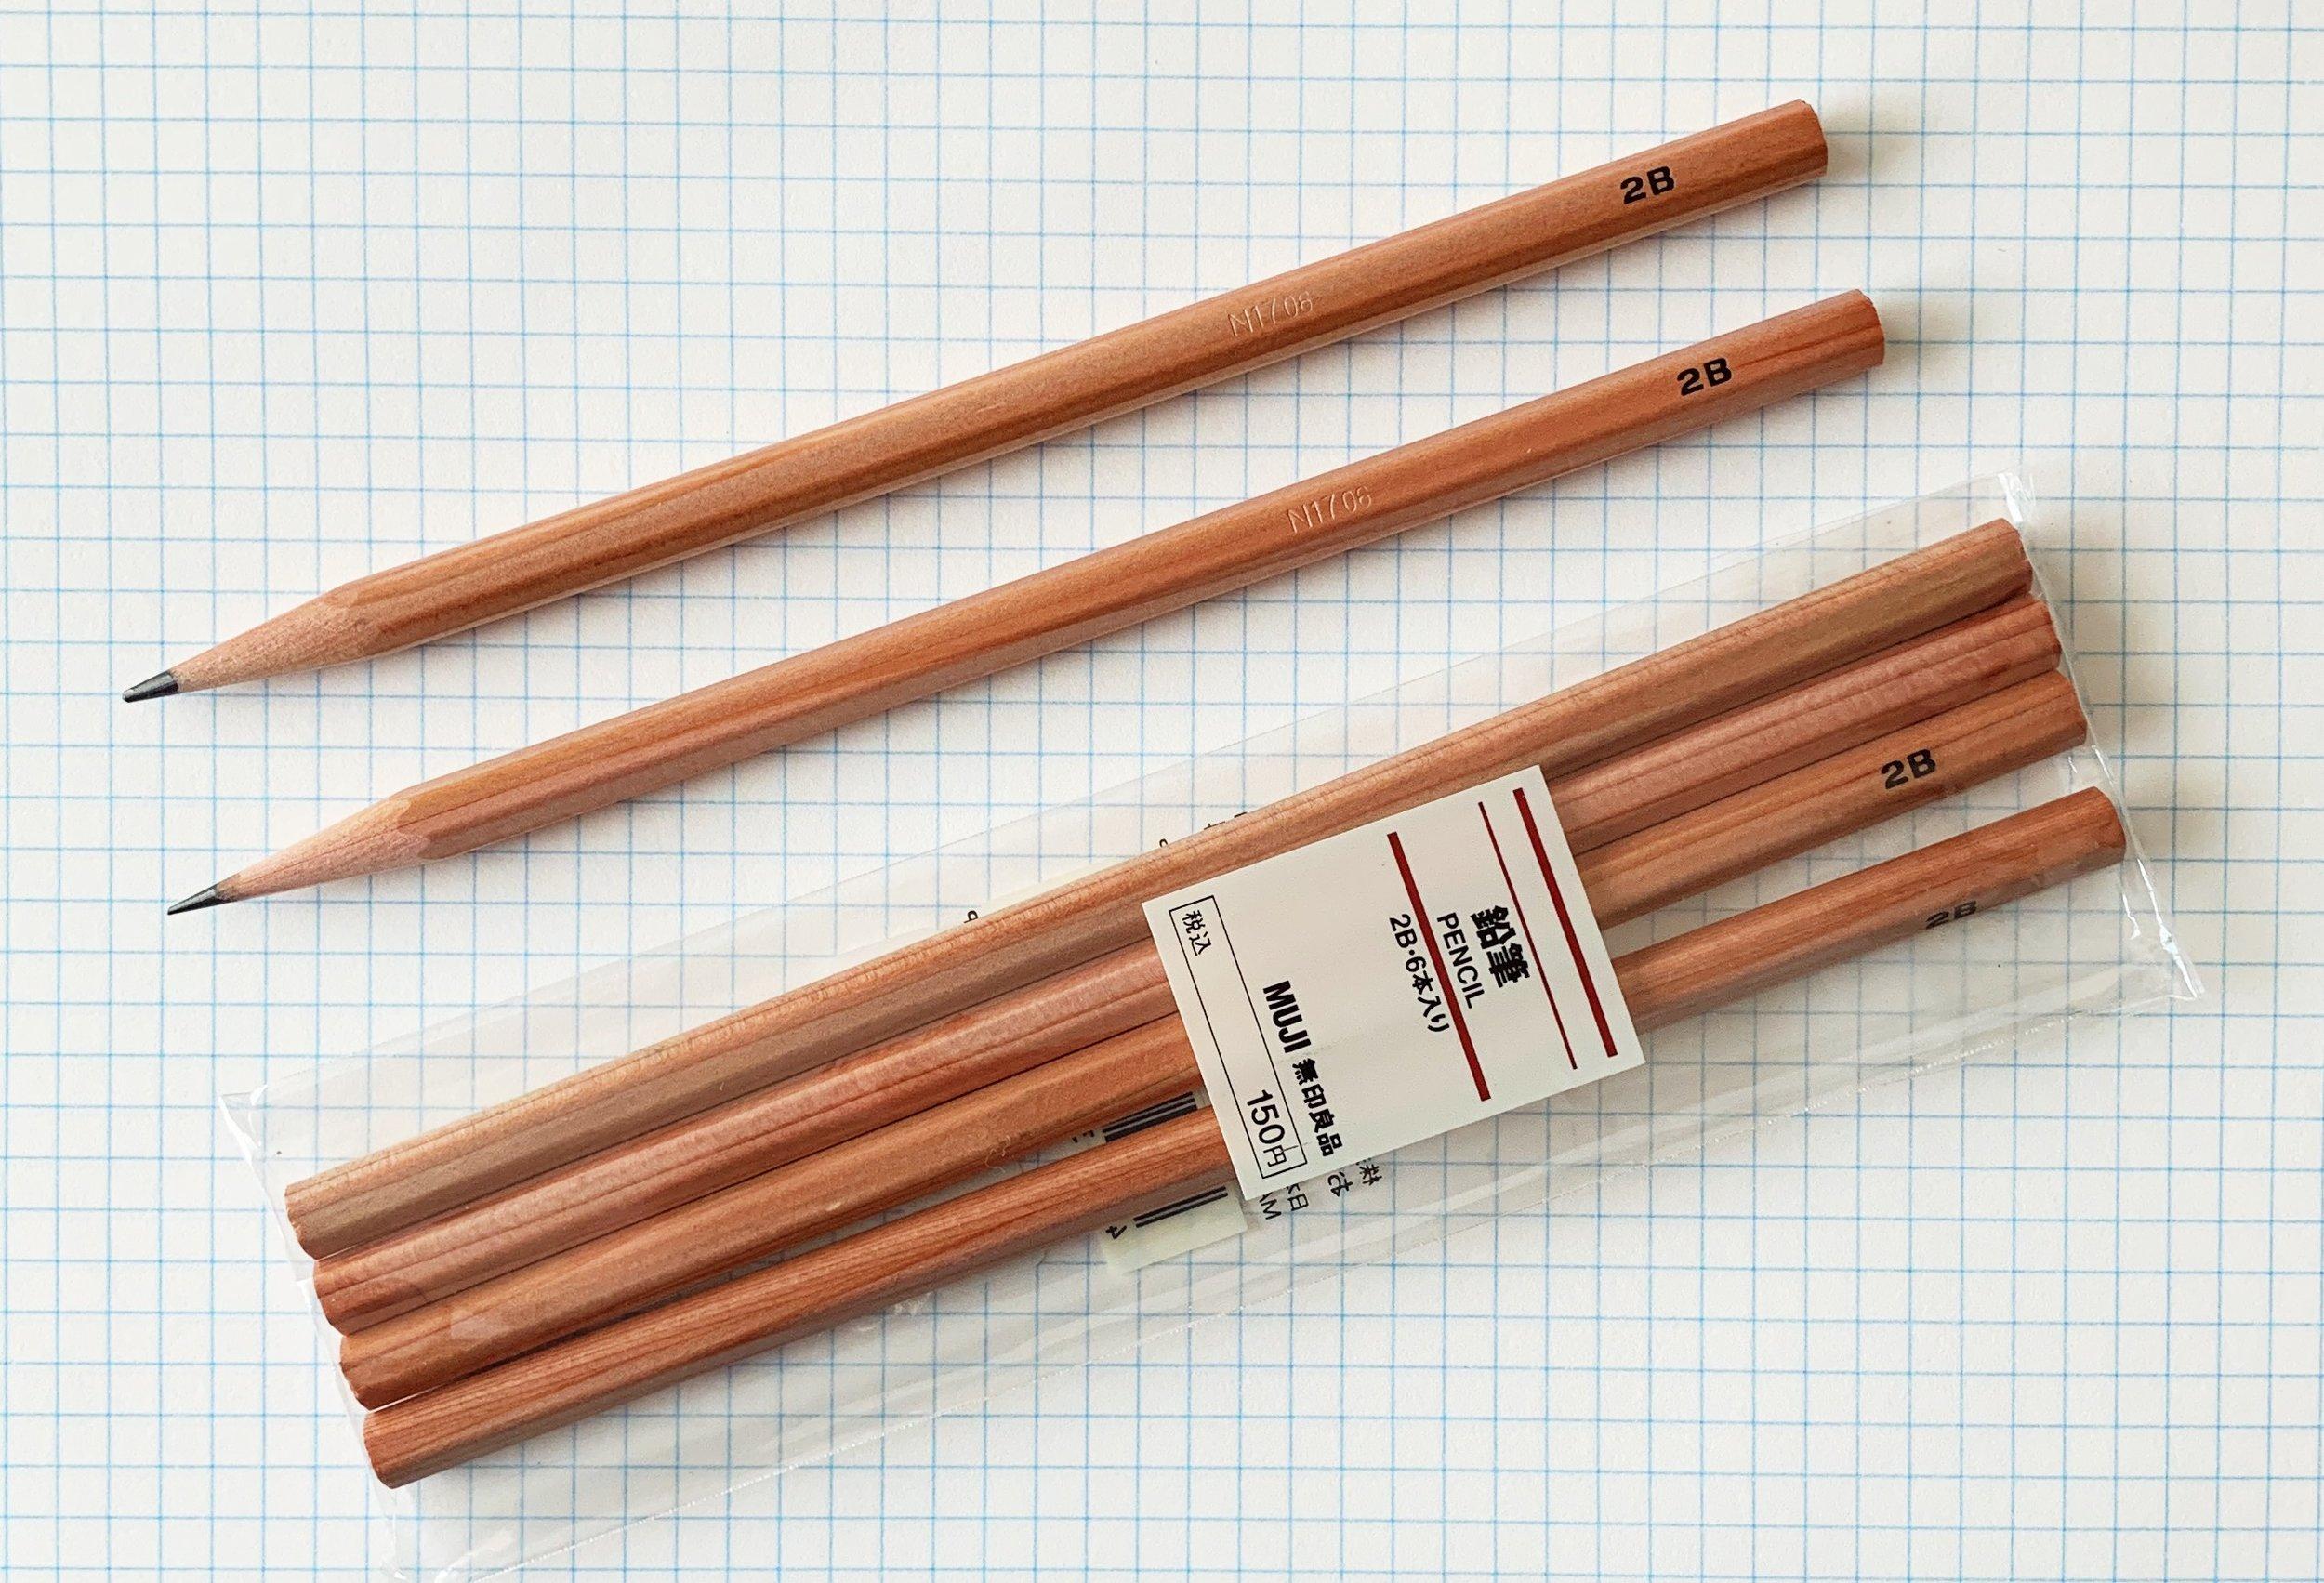 Muji 2B Pencil Review